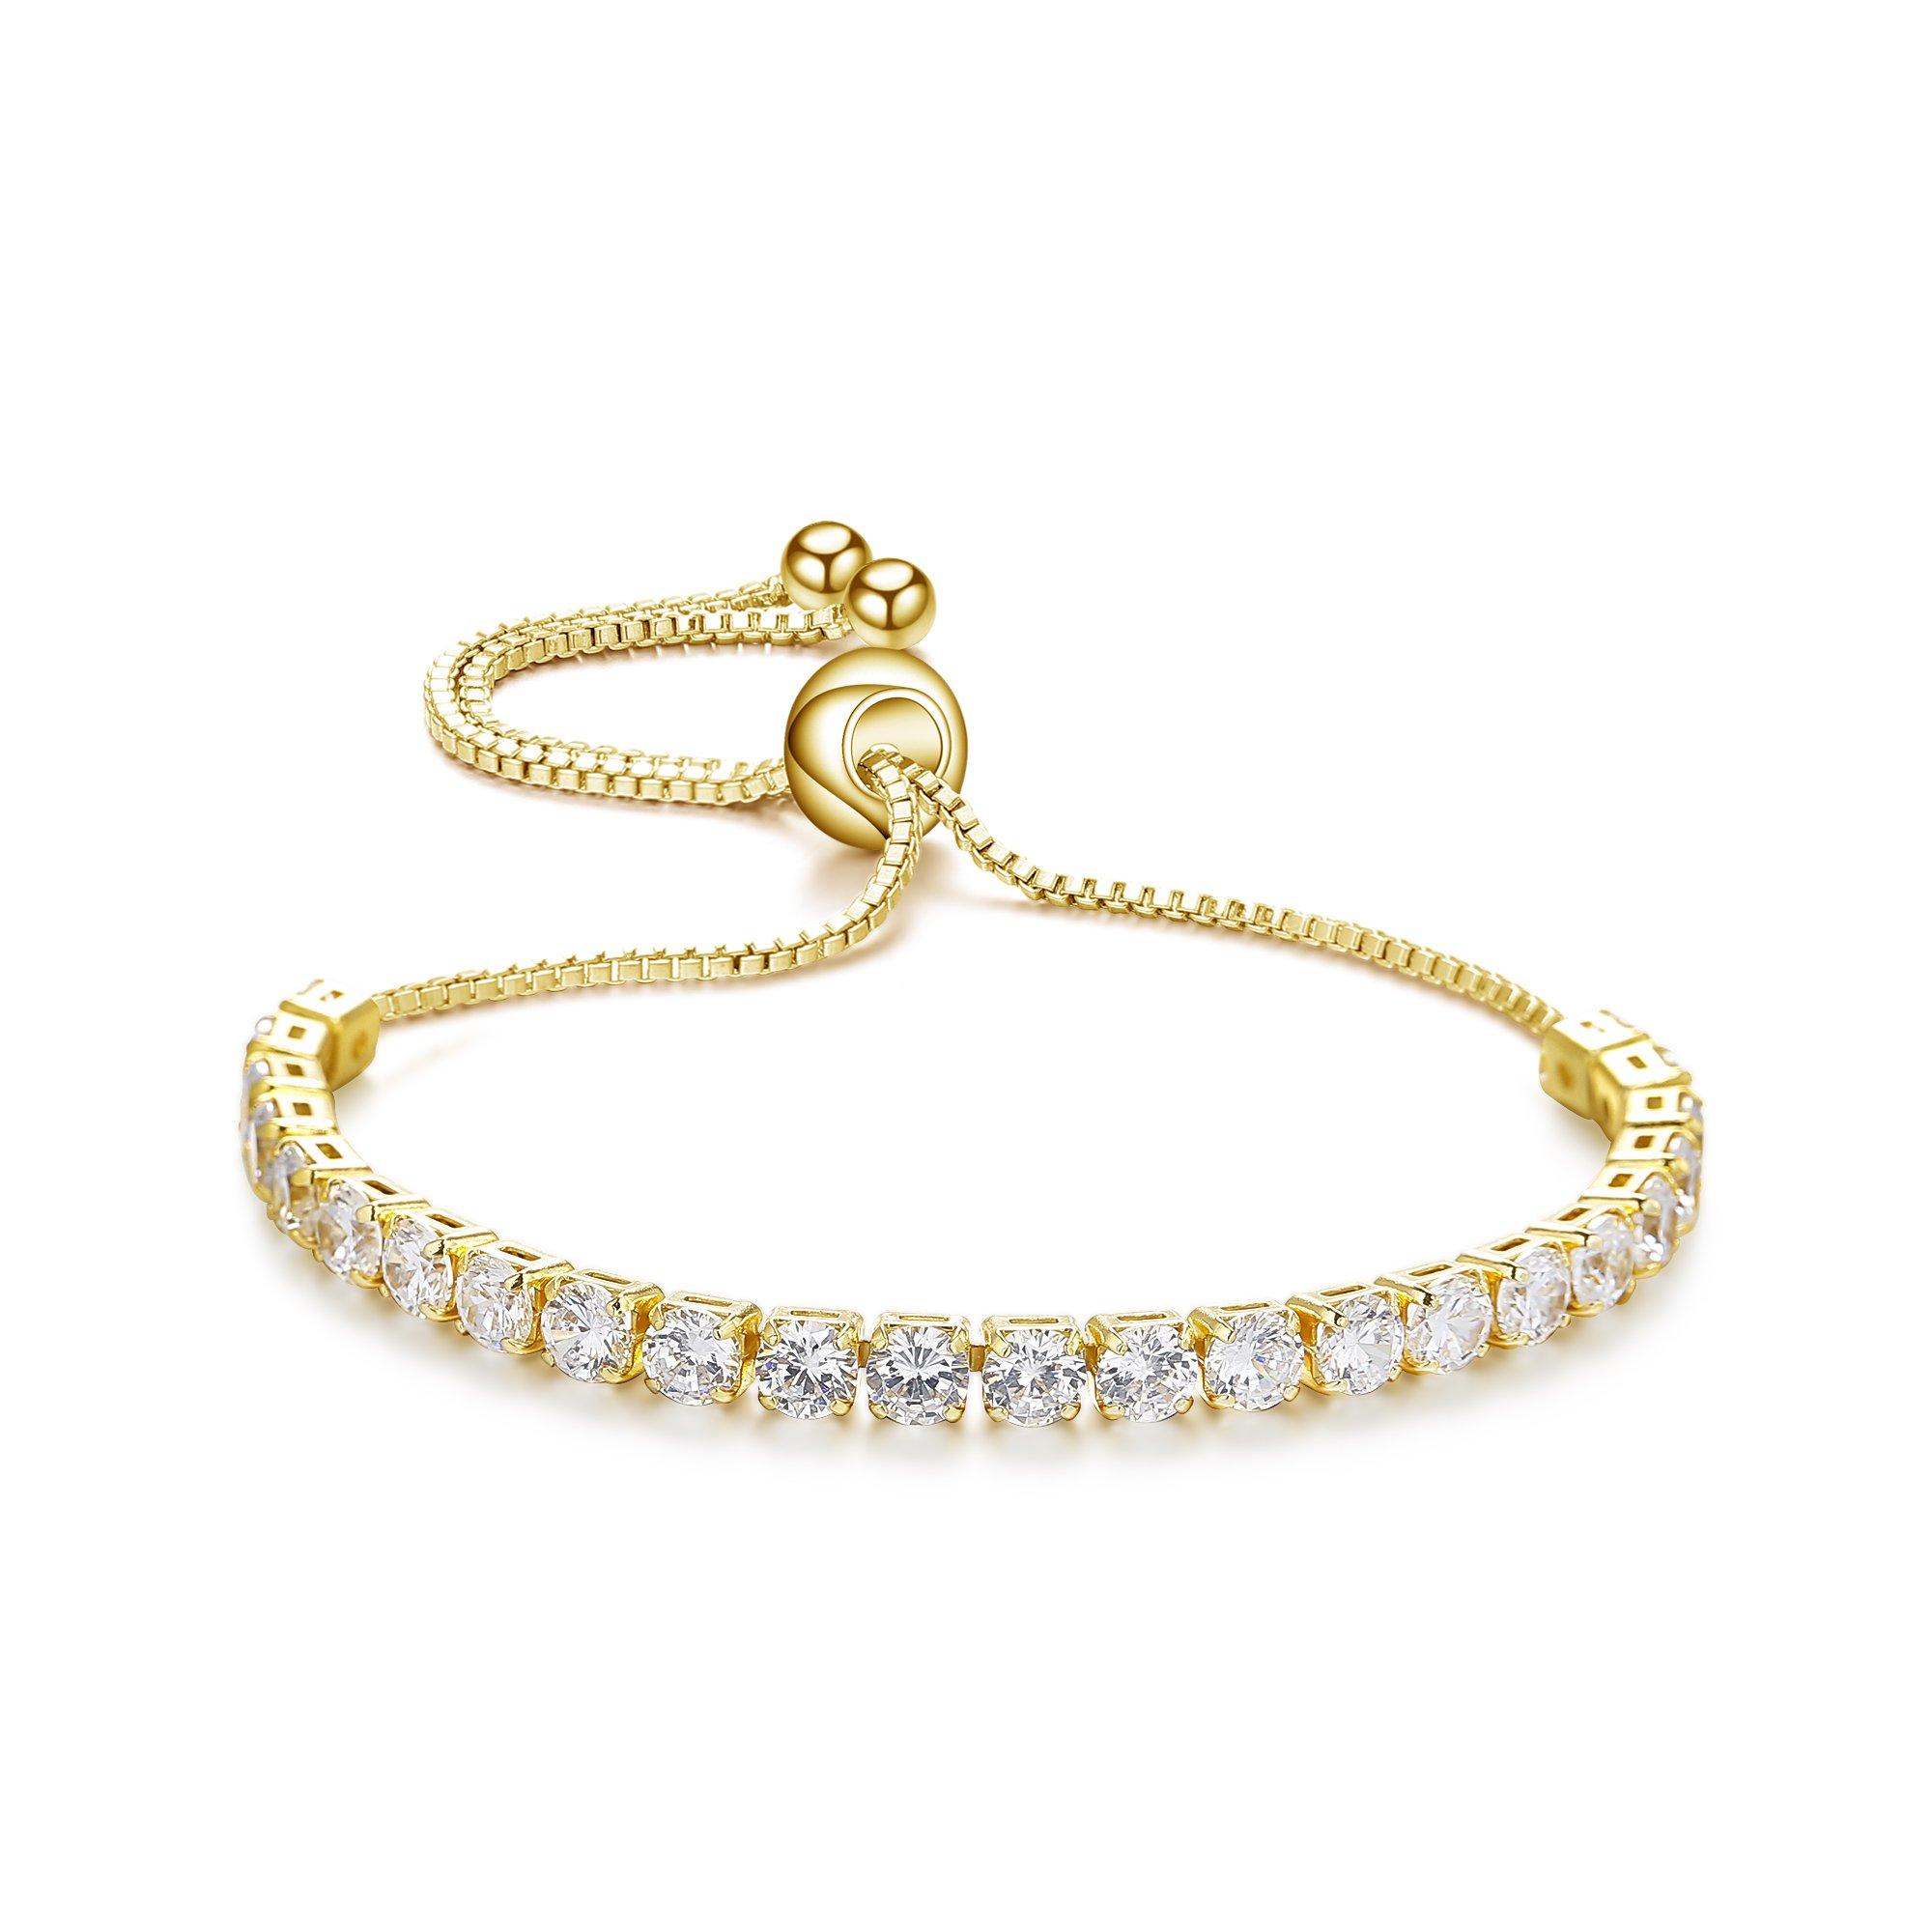 ASHMITA Fashion Adjustable Chain Bracelet for Women,Cubic Zirconia 18K Gold Gift Bracelet of Luxury Shining Jewelry